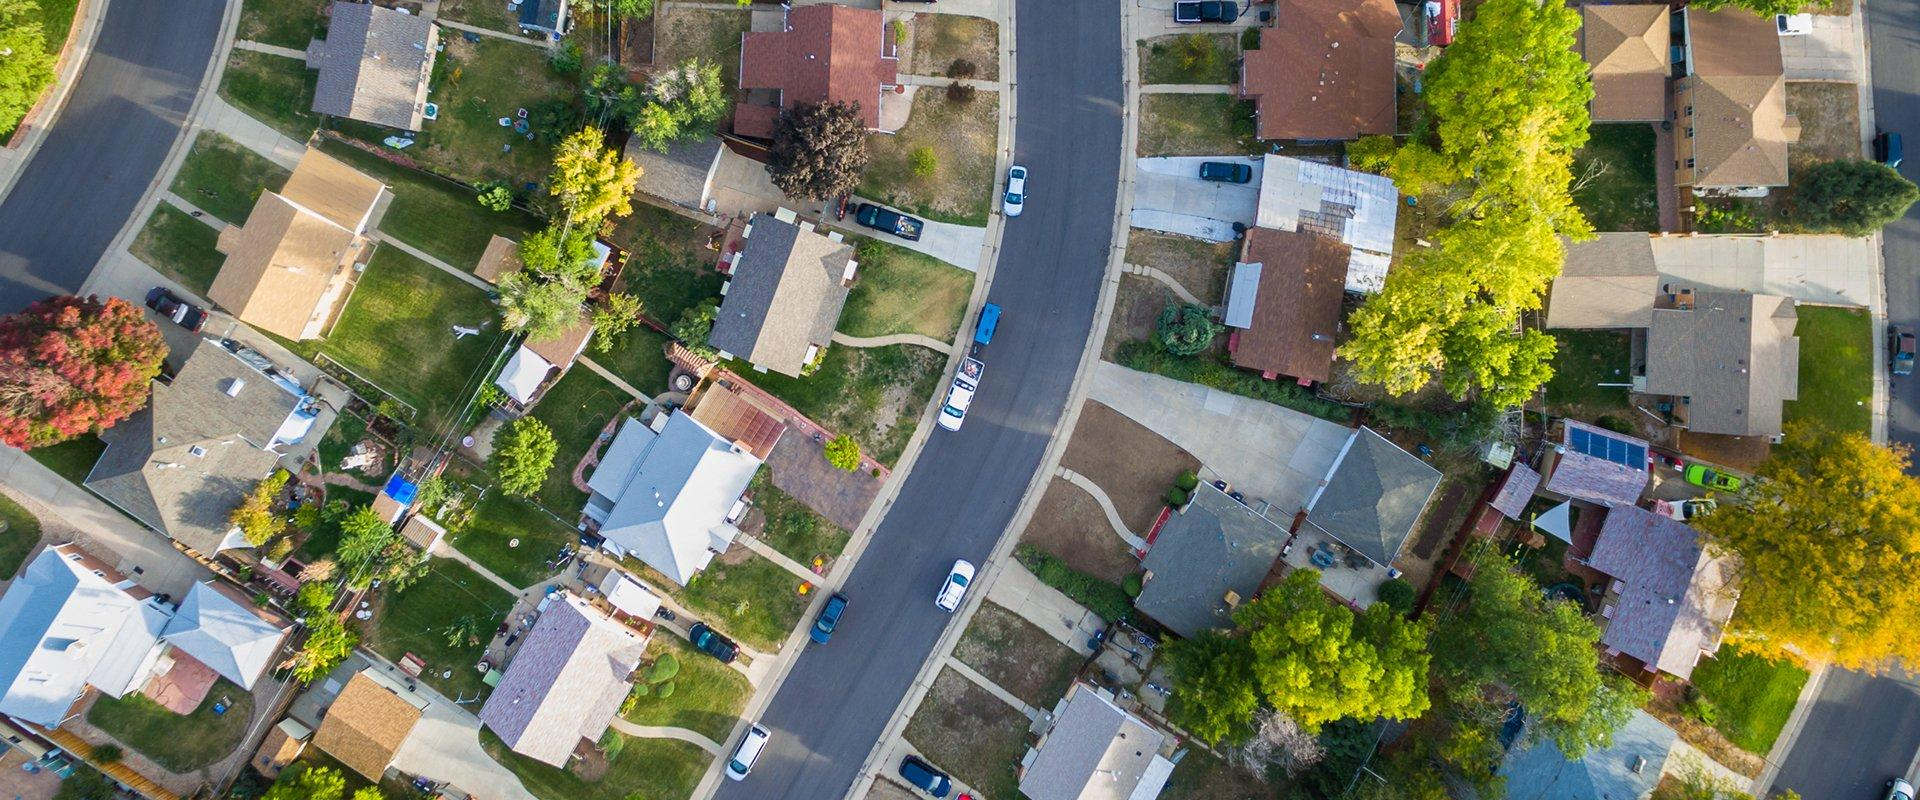 houses along streets